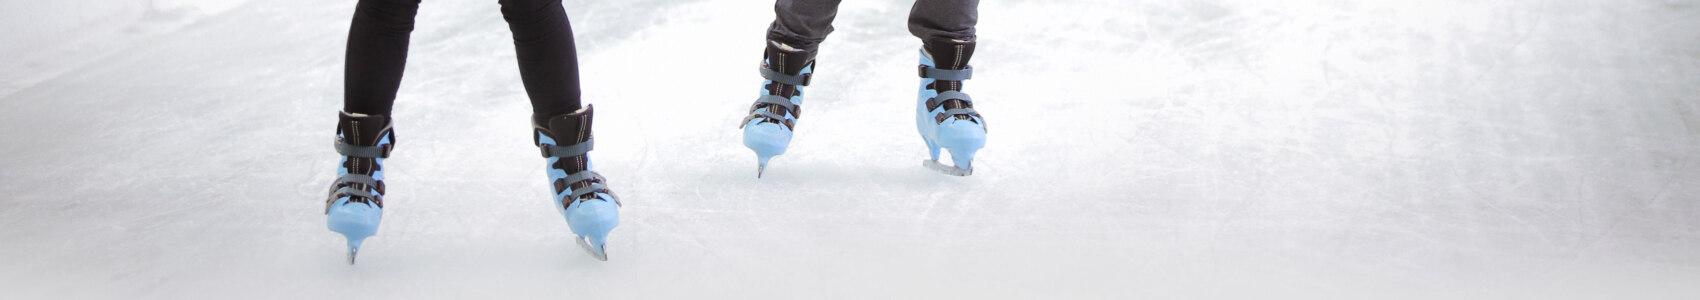 Aotea Square Ice Rink Waitlist